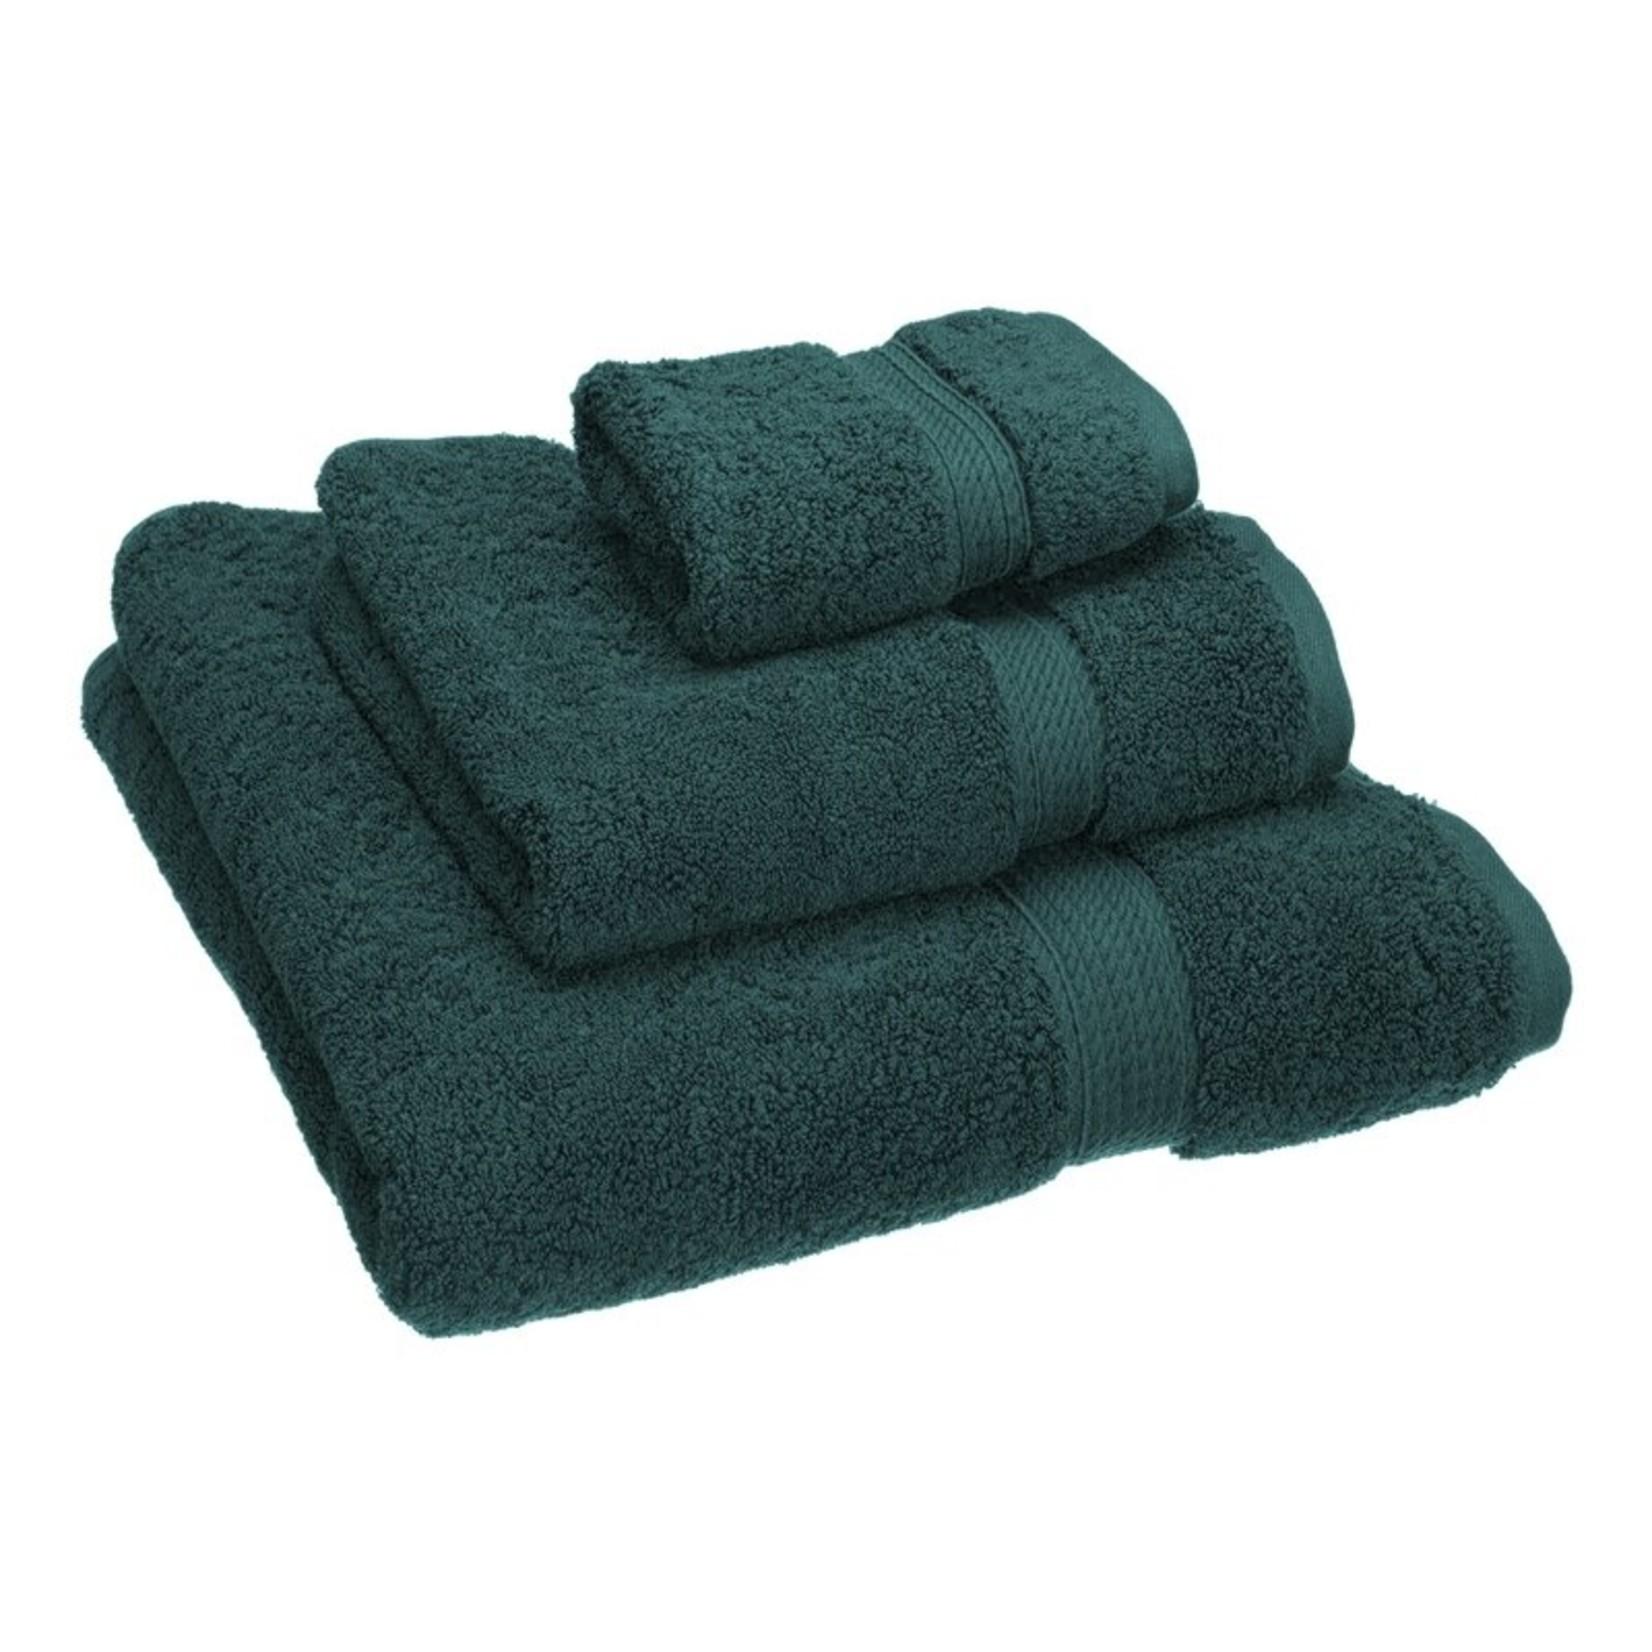 *Huson 3 Piece Egyptian-Quality Cotton Towel Set - Teal - Final Sale